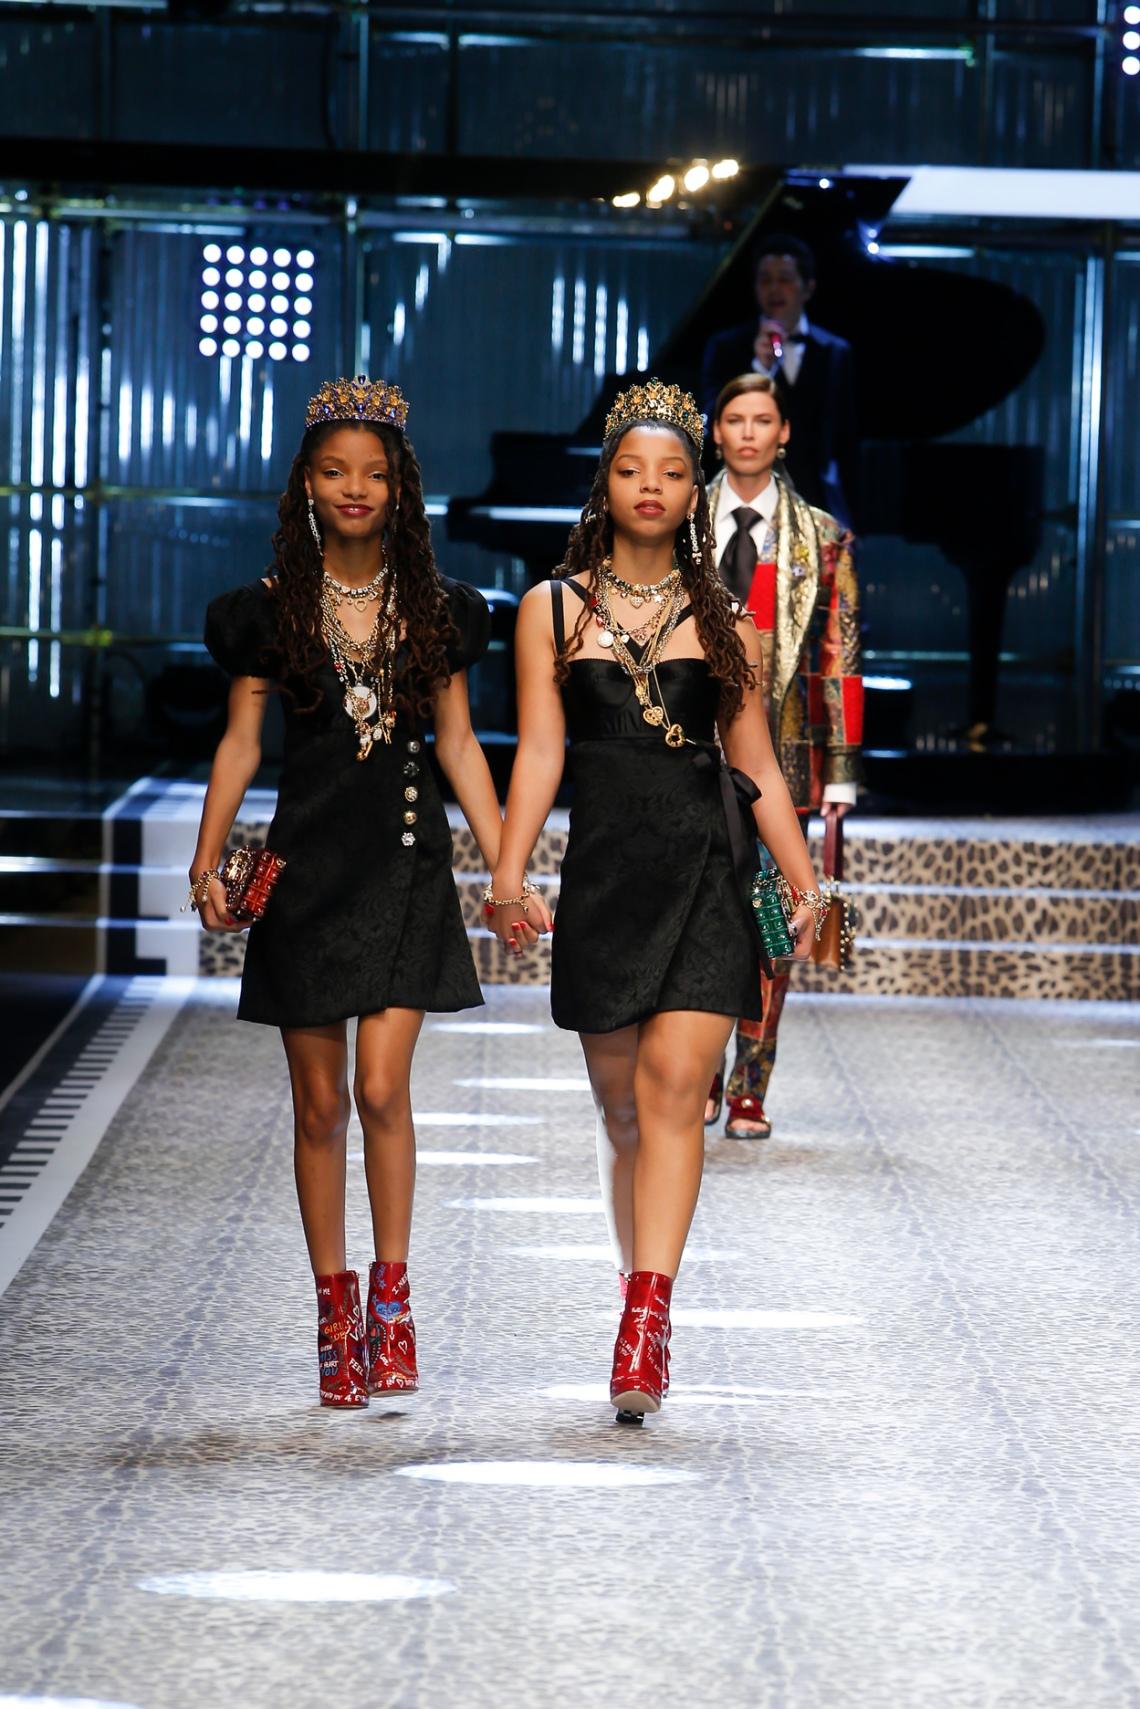 dolce-and-gabbana-fall-winter-2017-18-women-fashion-show-runway-74